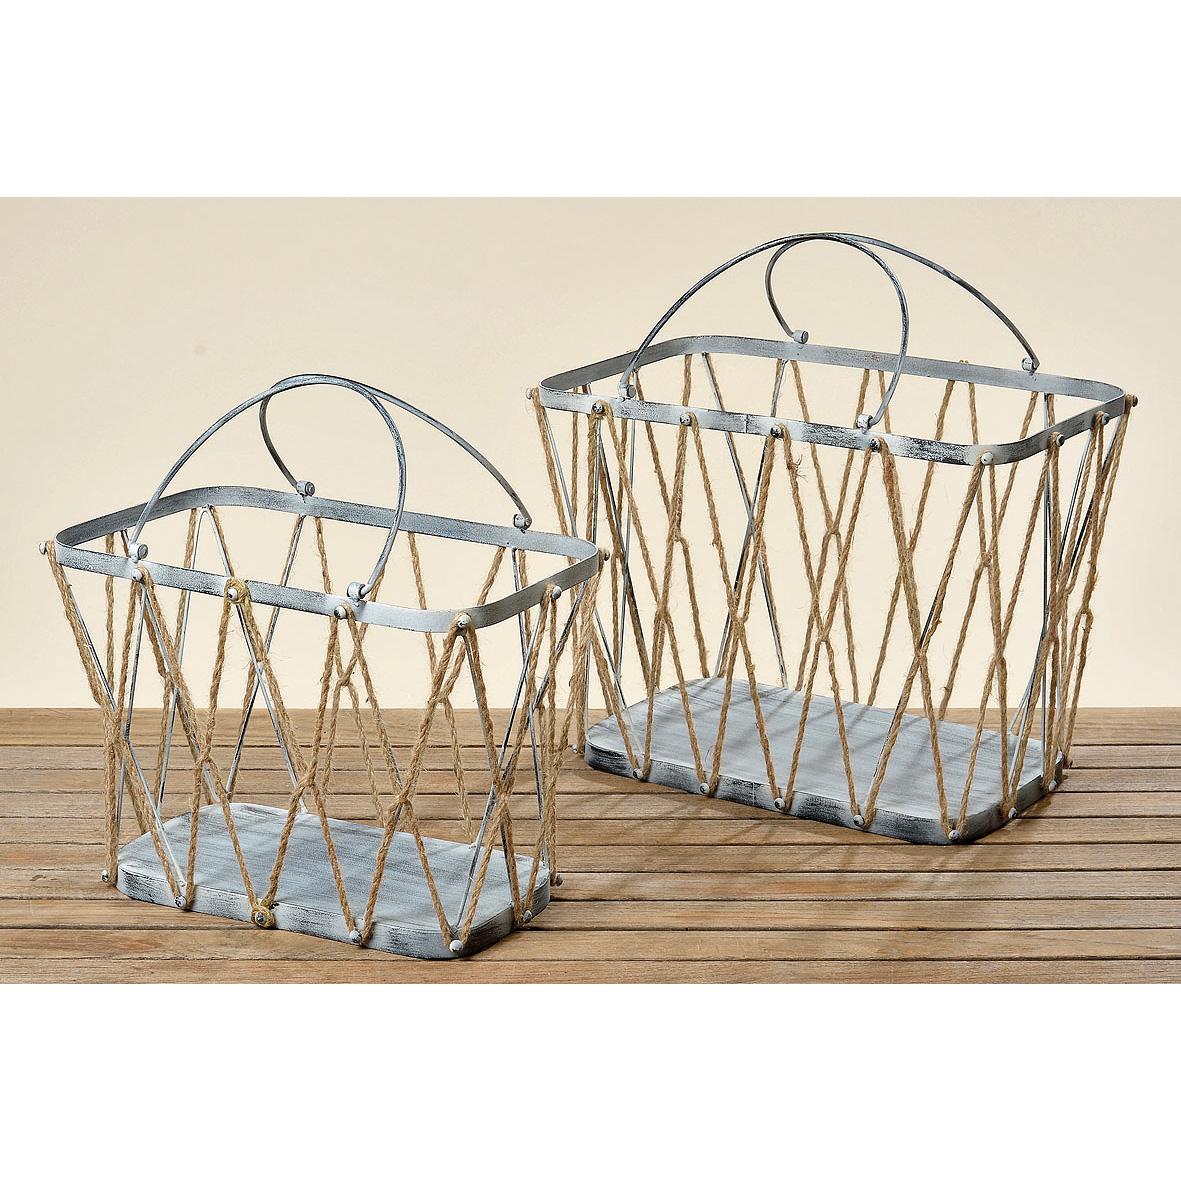 korb aus metall mit hanfseilen eckig 42cm 028869 sunflower design. Black Bedroom Furniture Sets. Home Design Ideas